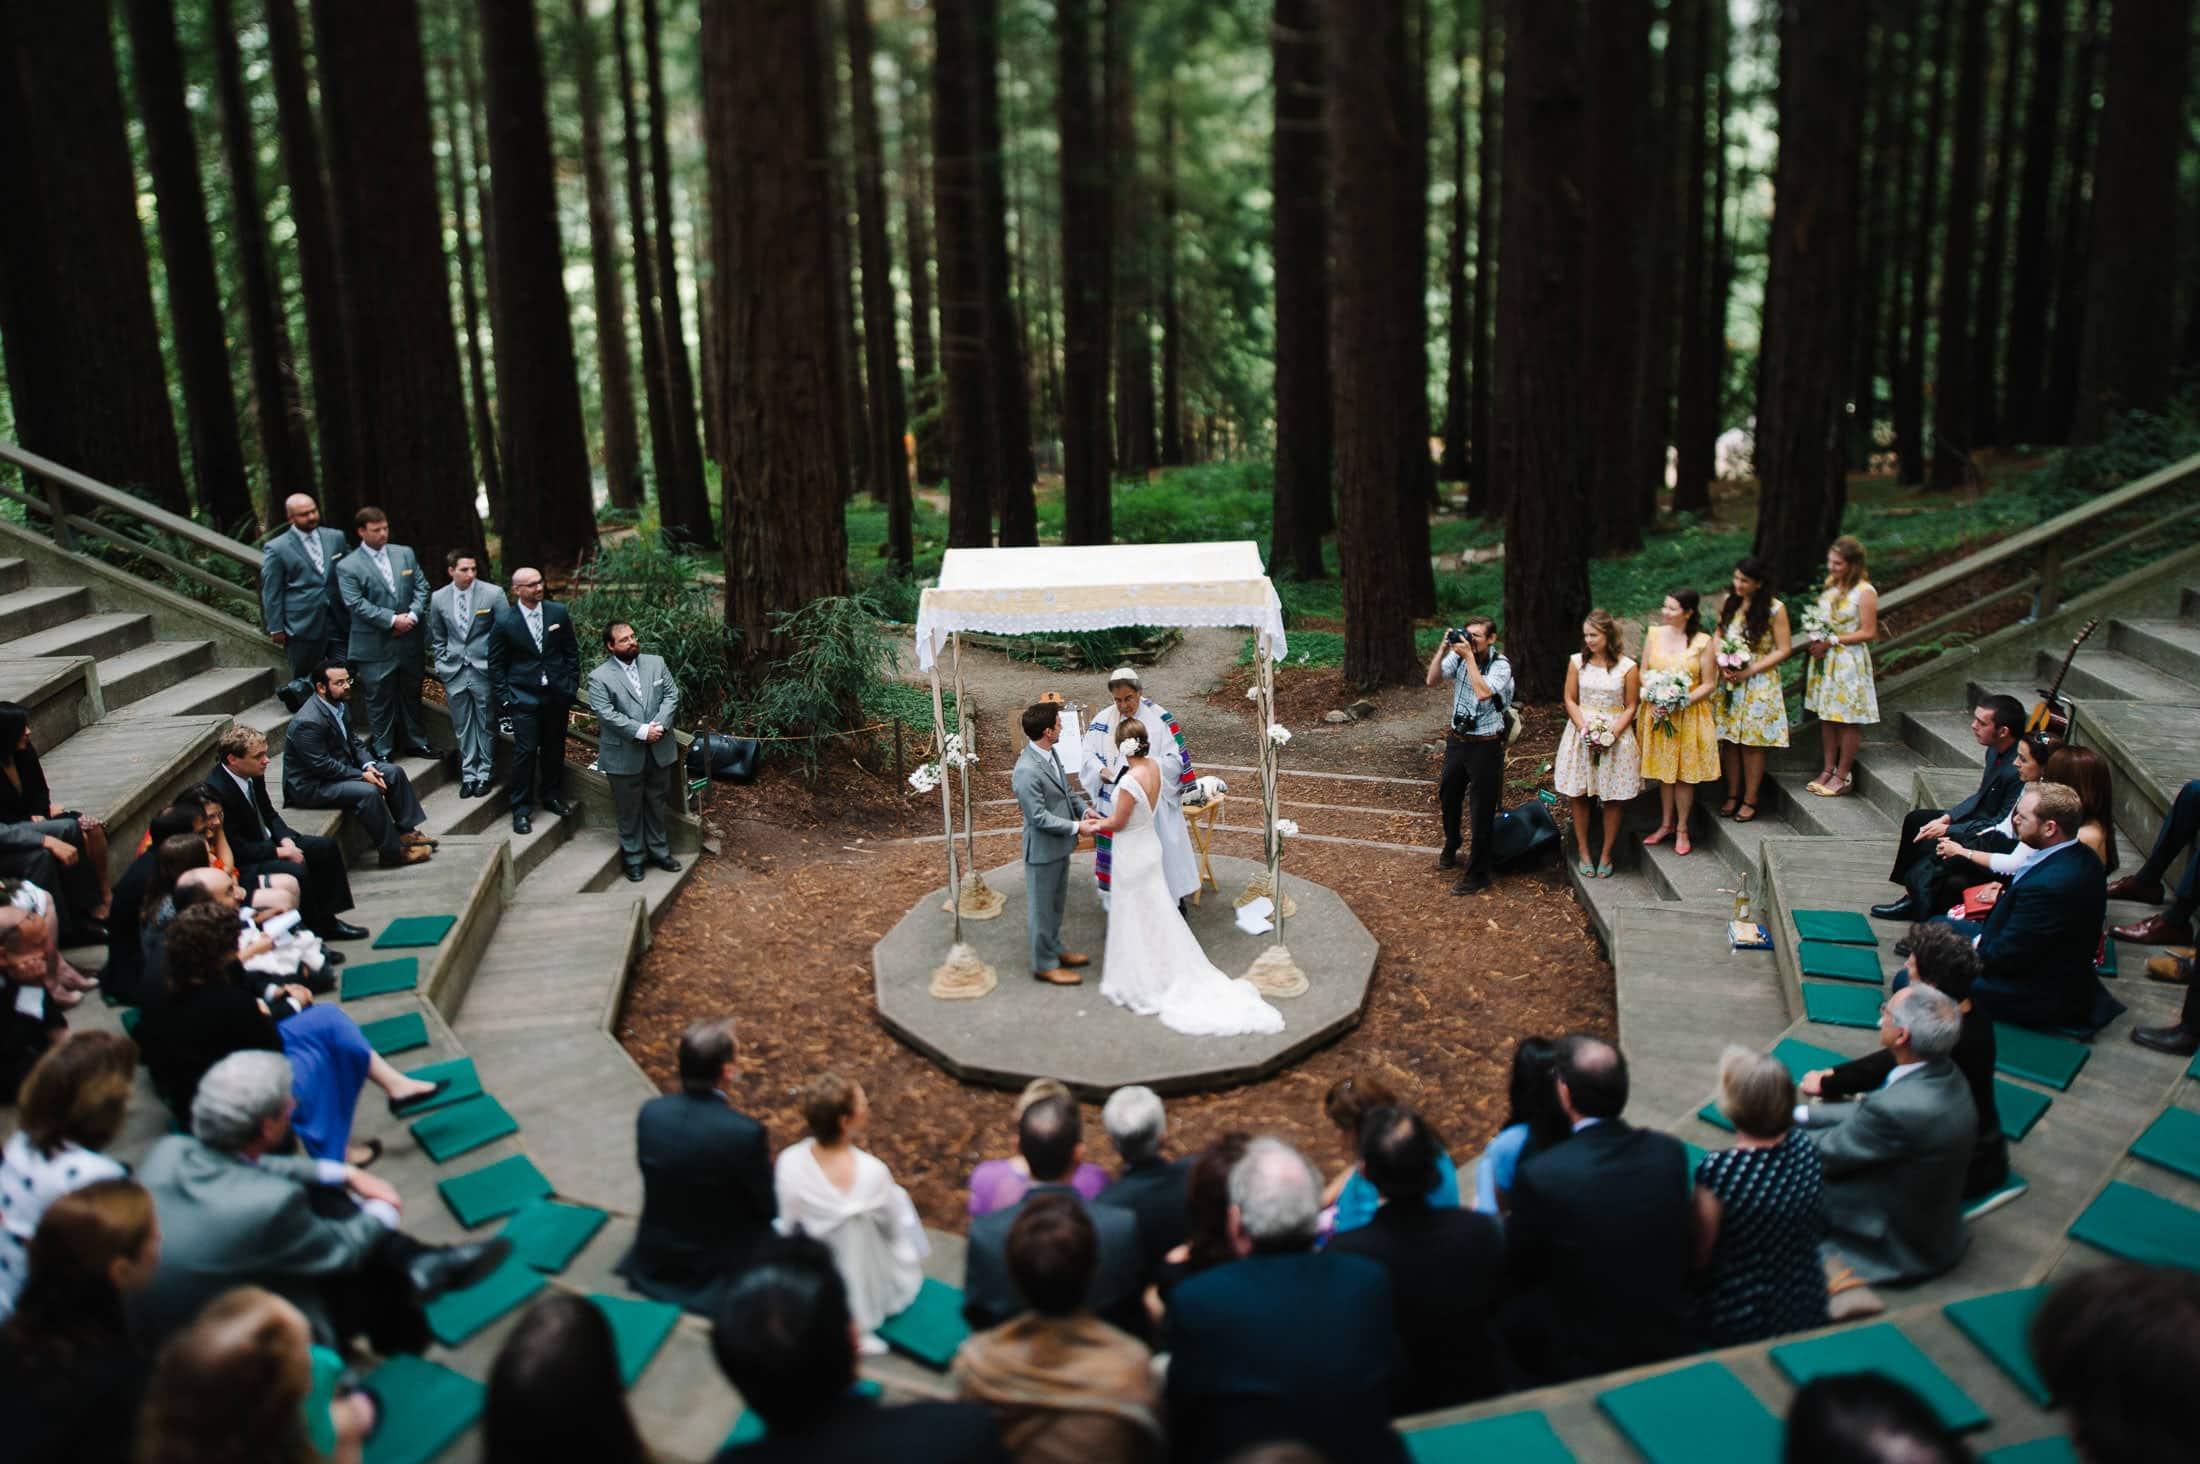 Artistic UC Botanical Garden Wedding in Redwood Grove